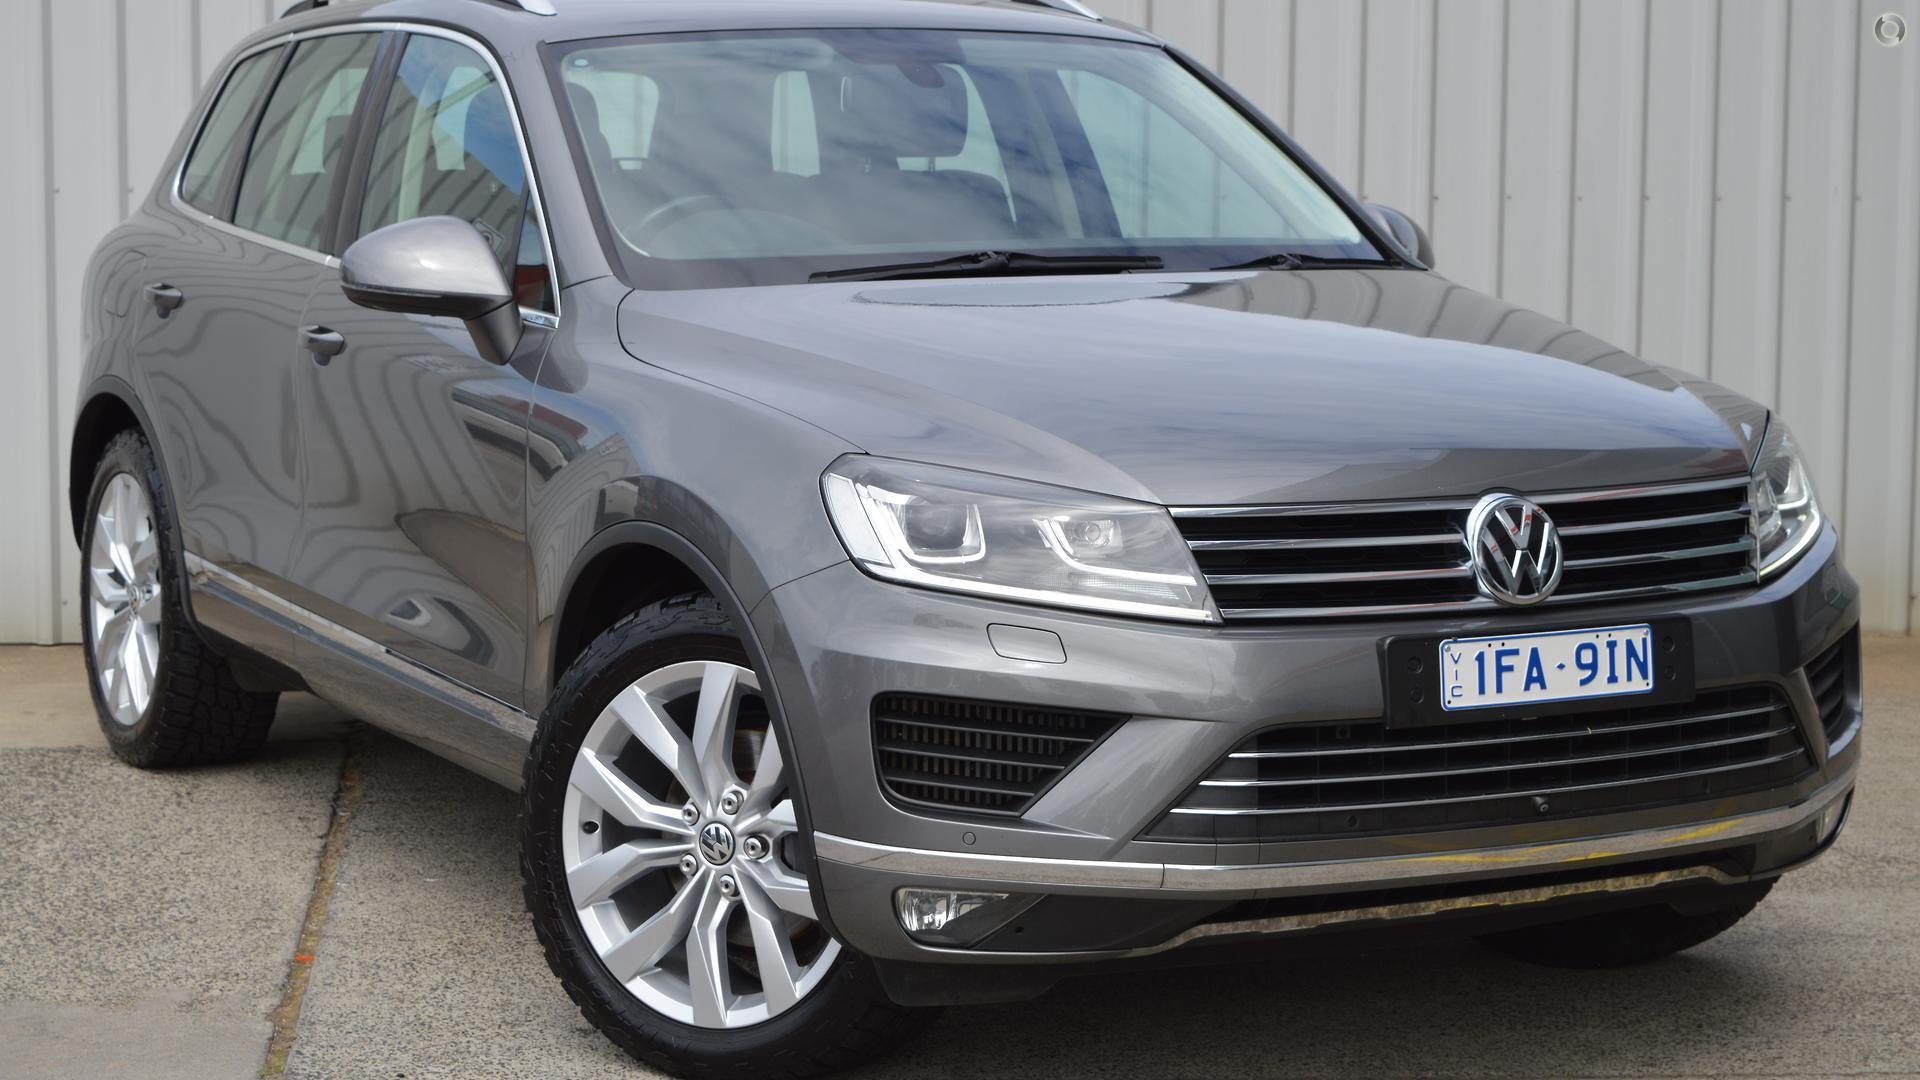 2015 Volkswagen Touareg 7P